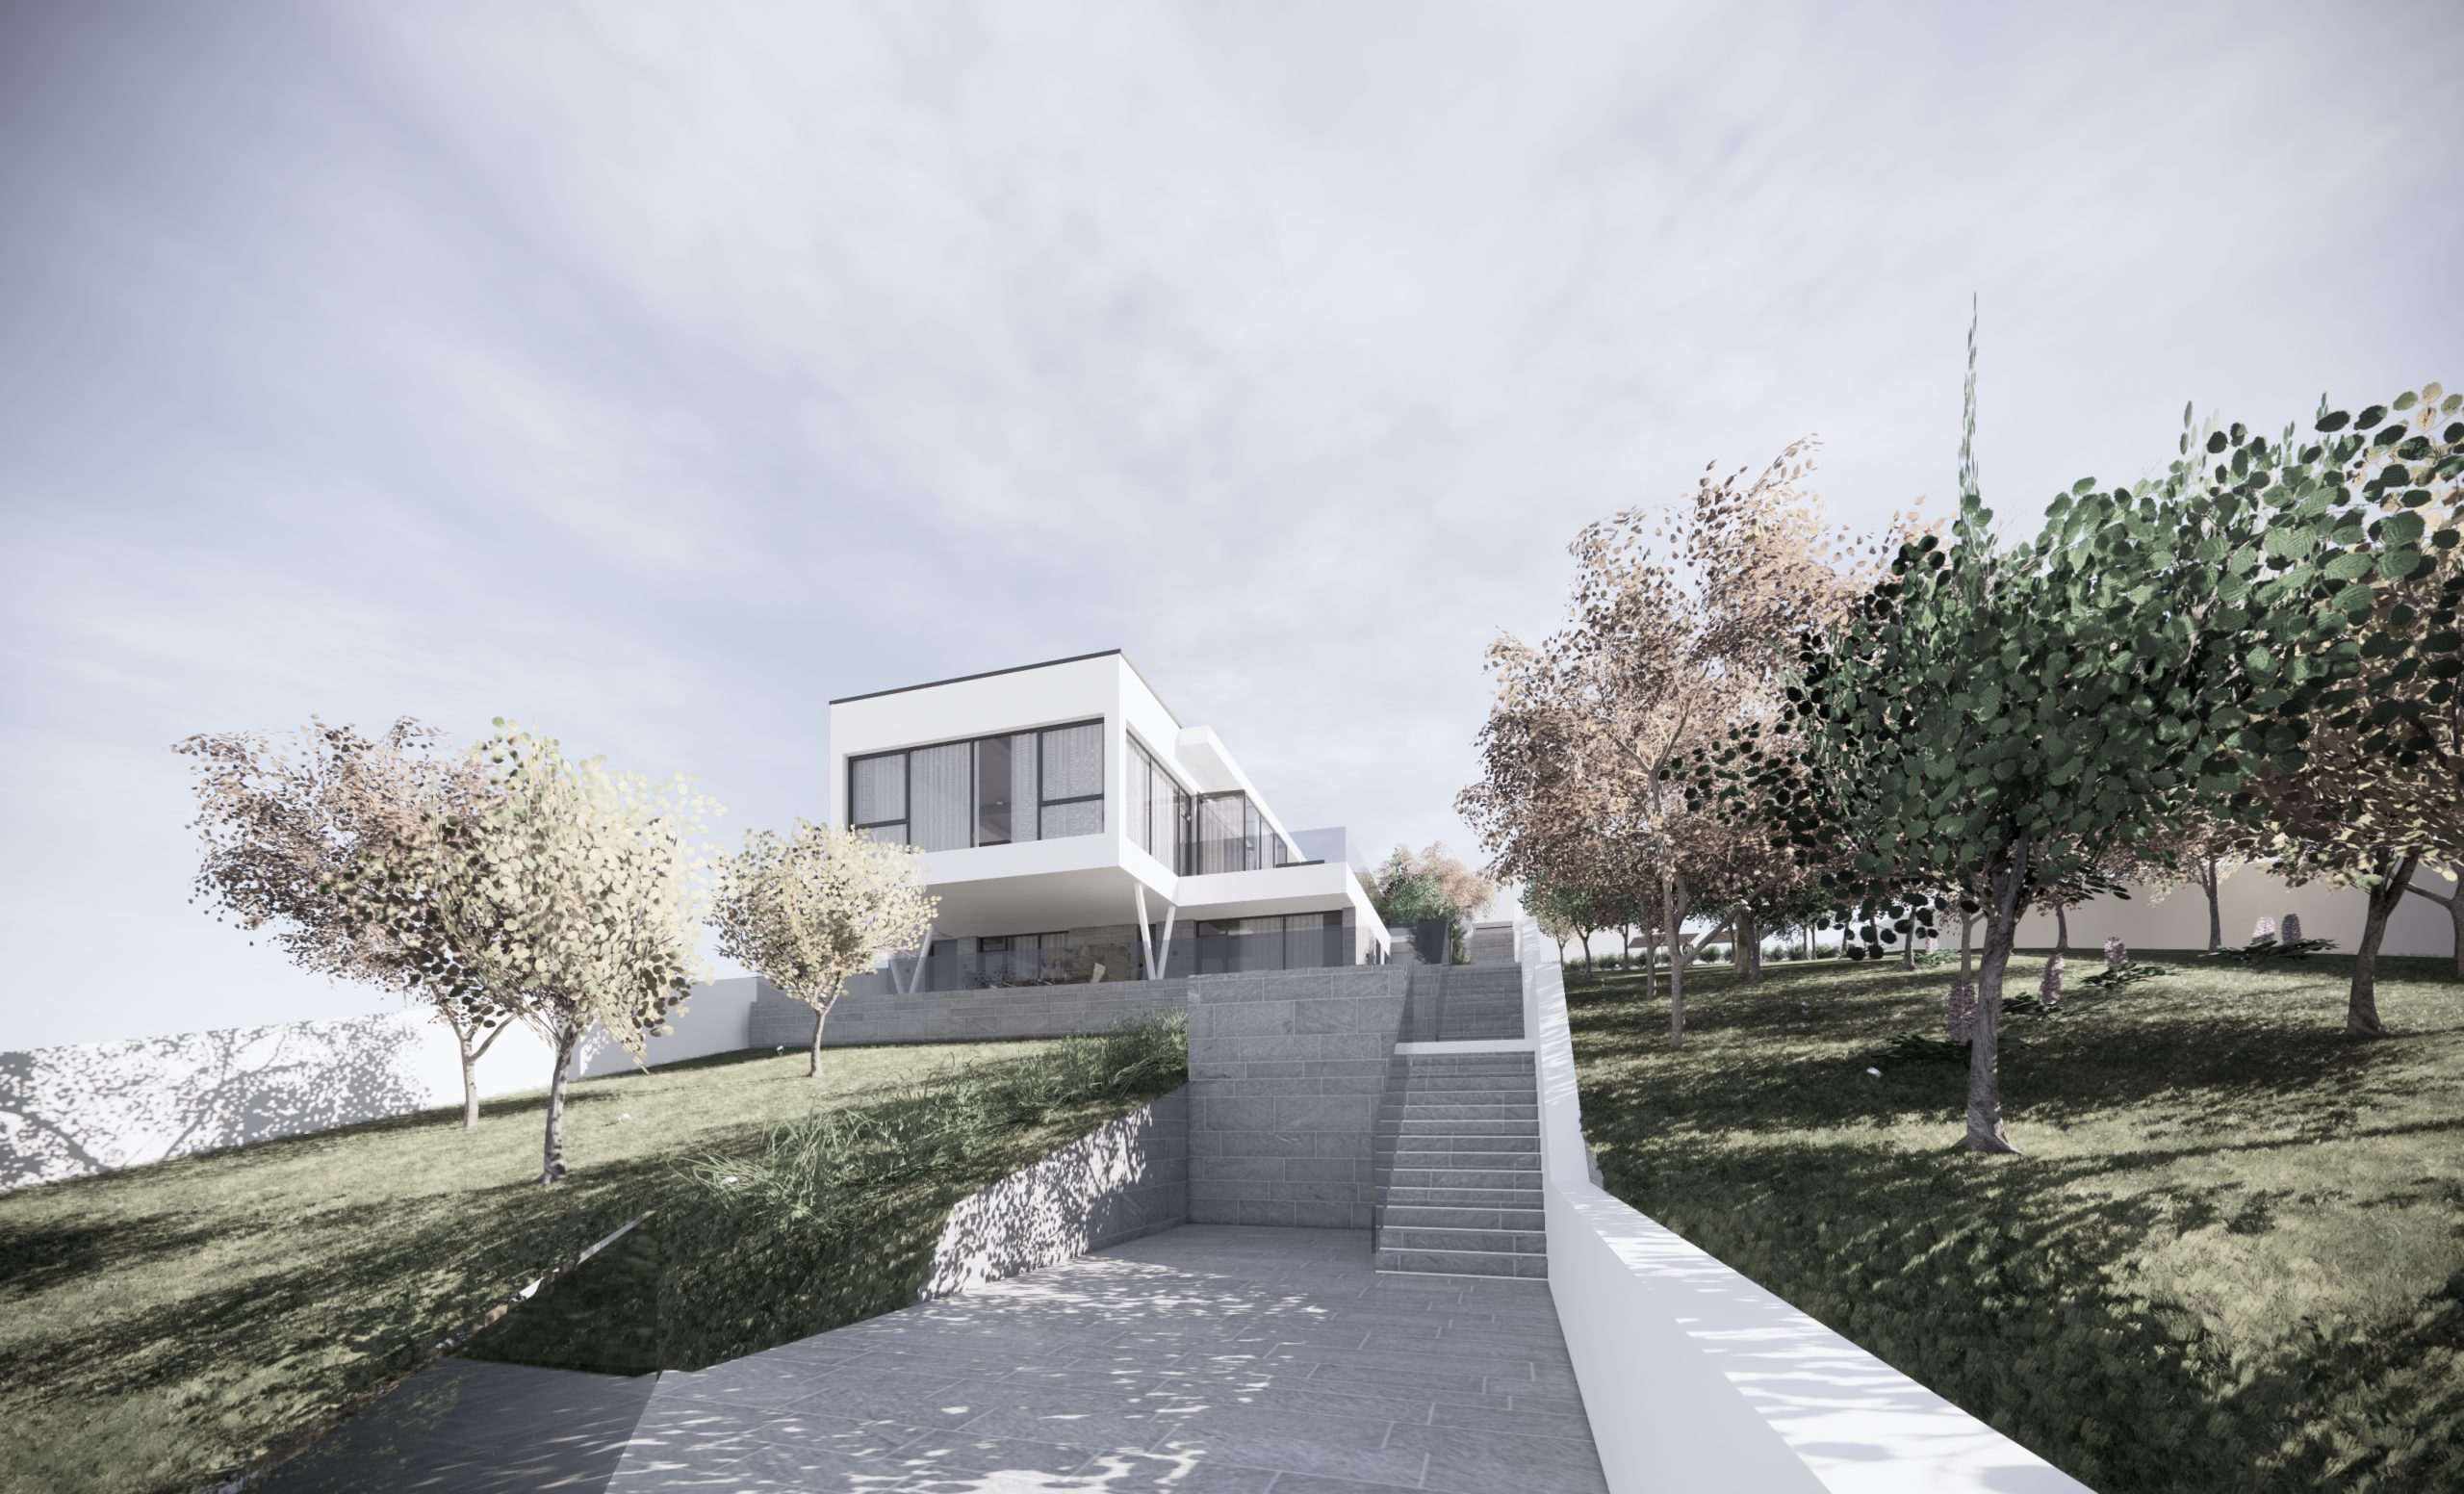 https://nbc-arhitect.ro/wp-content/uploads/2020/11/NBC-Arhitect-_-residential-_-2x-Snagov-_-Snagov-Romania_21-scaled.jpg